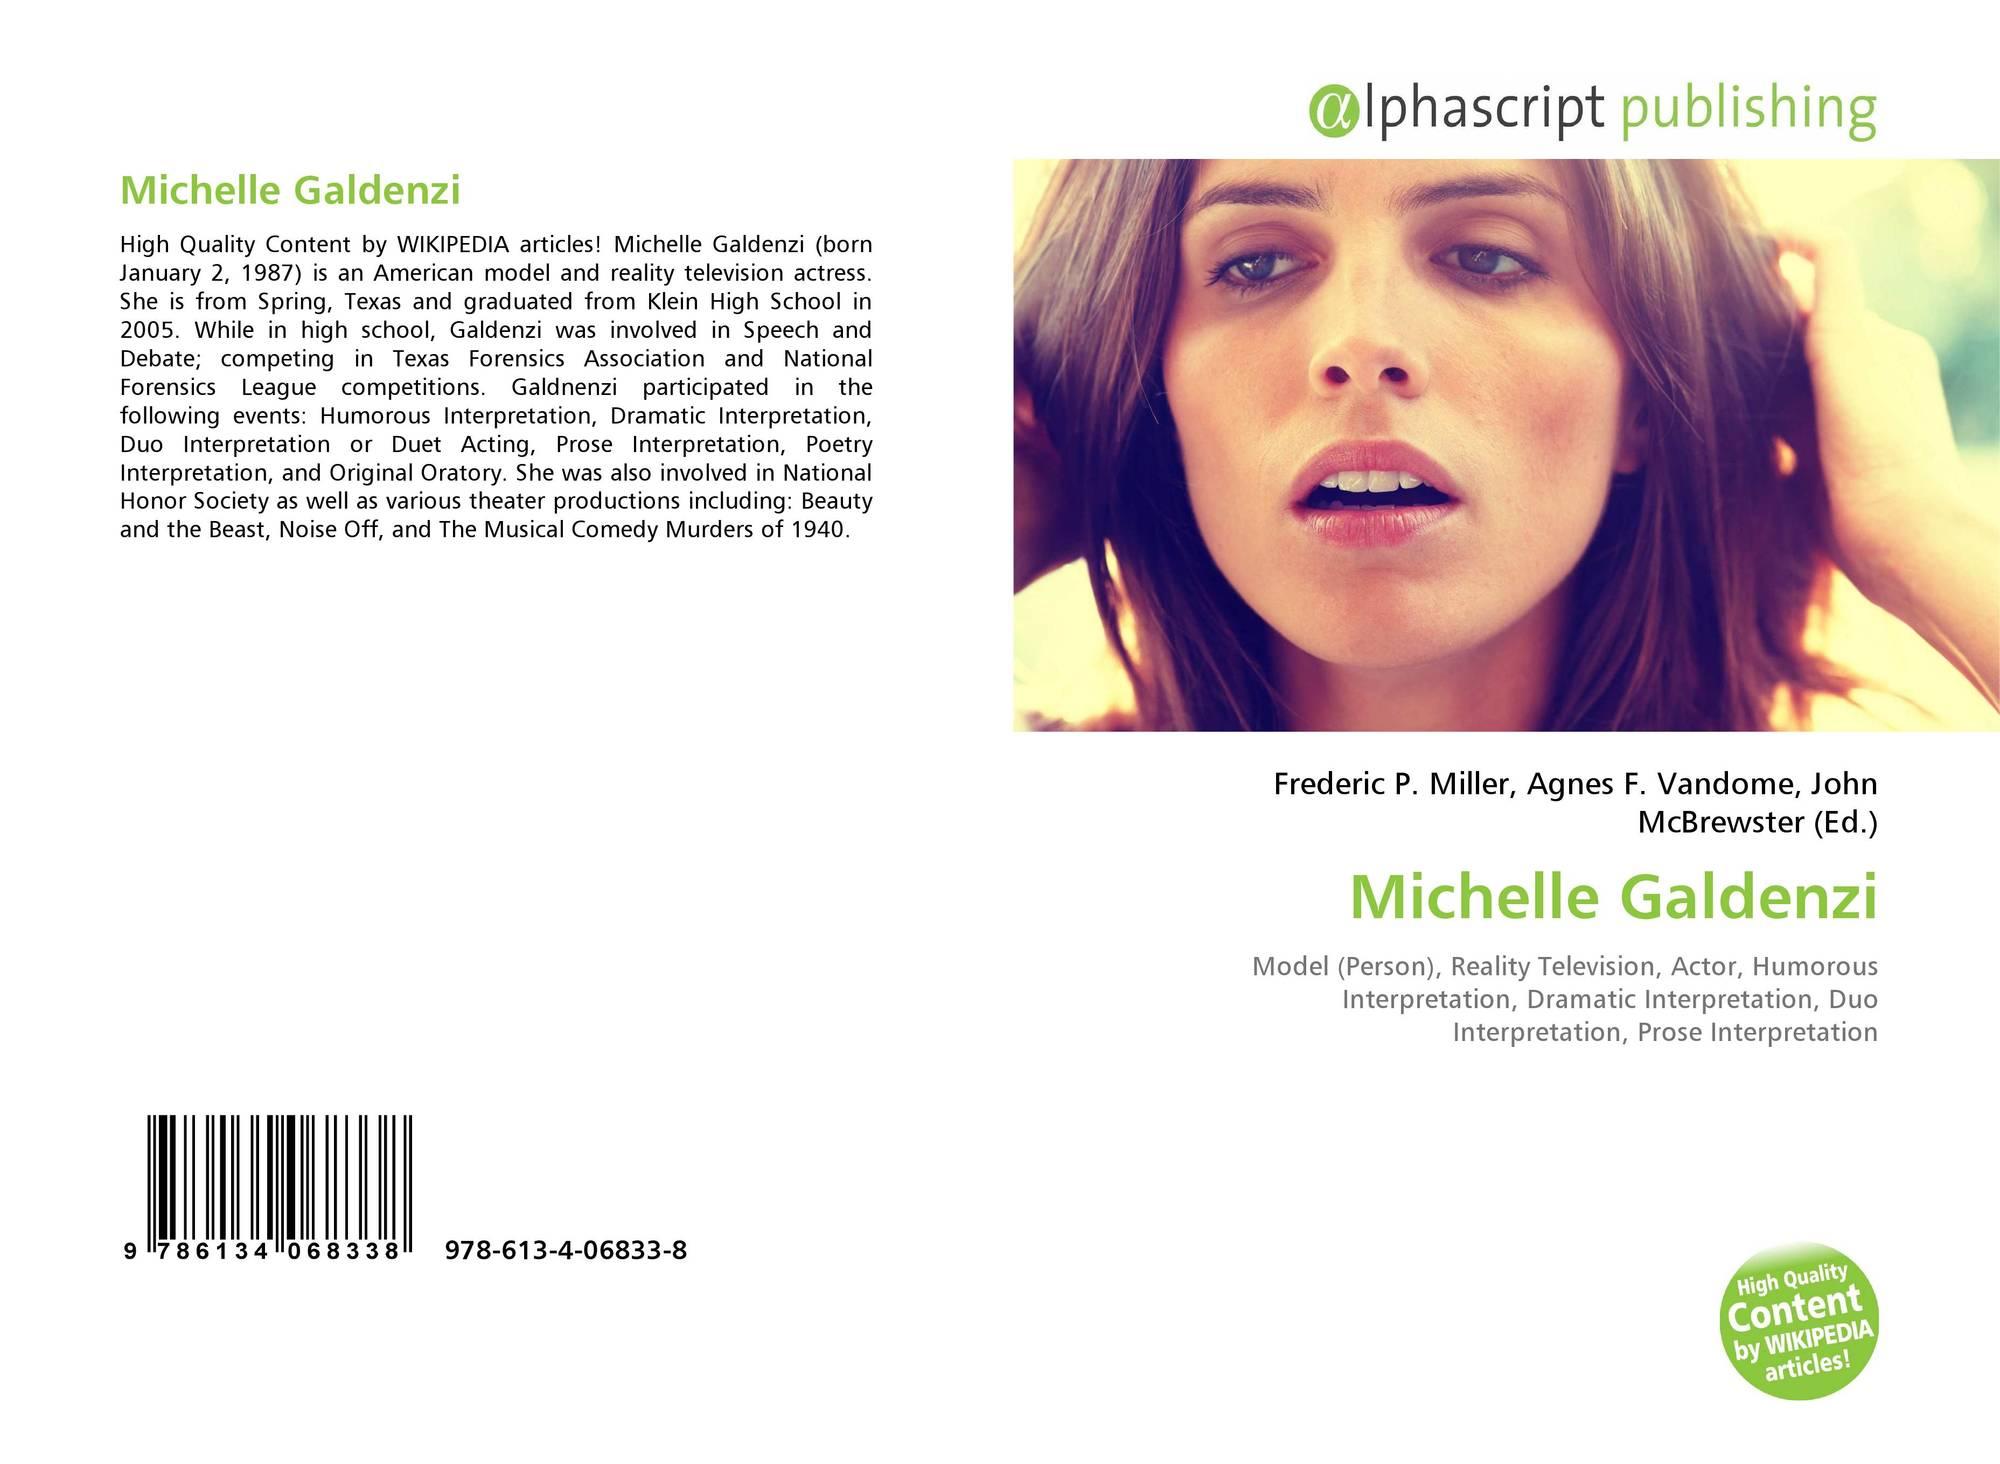 Communication on this topic: Tara Lynne O'Neill, michelle-galdenzi/